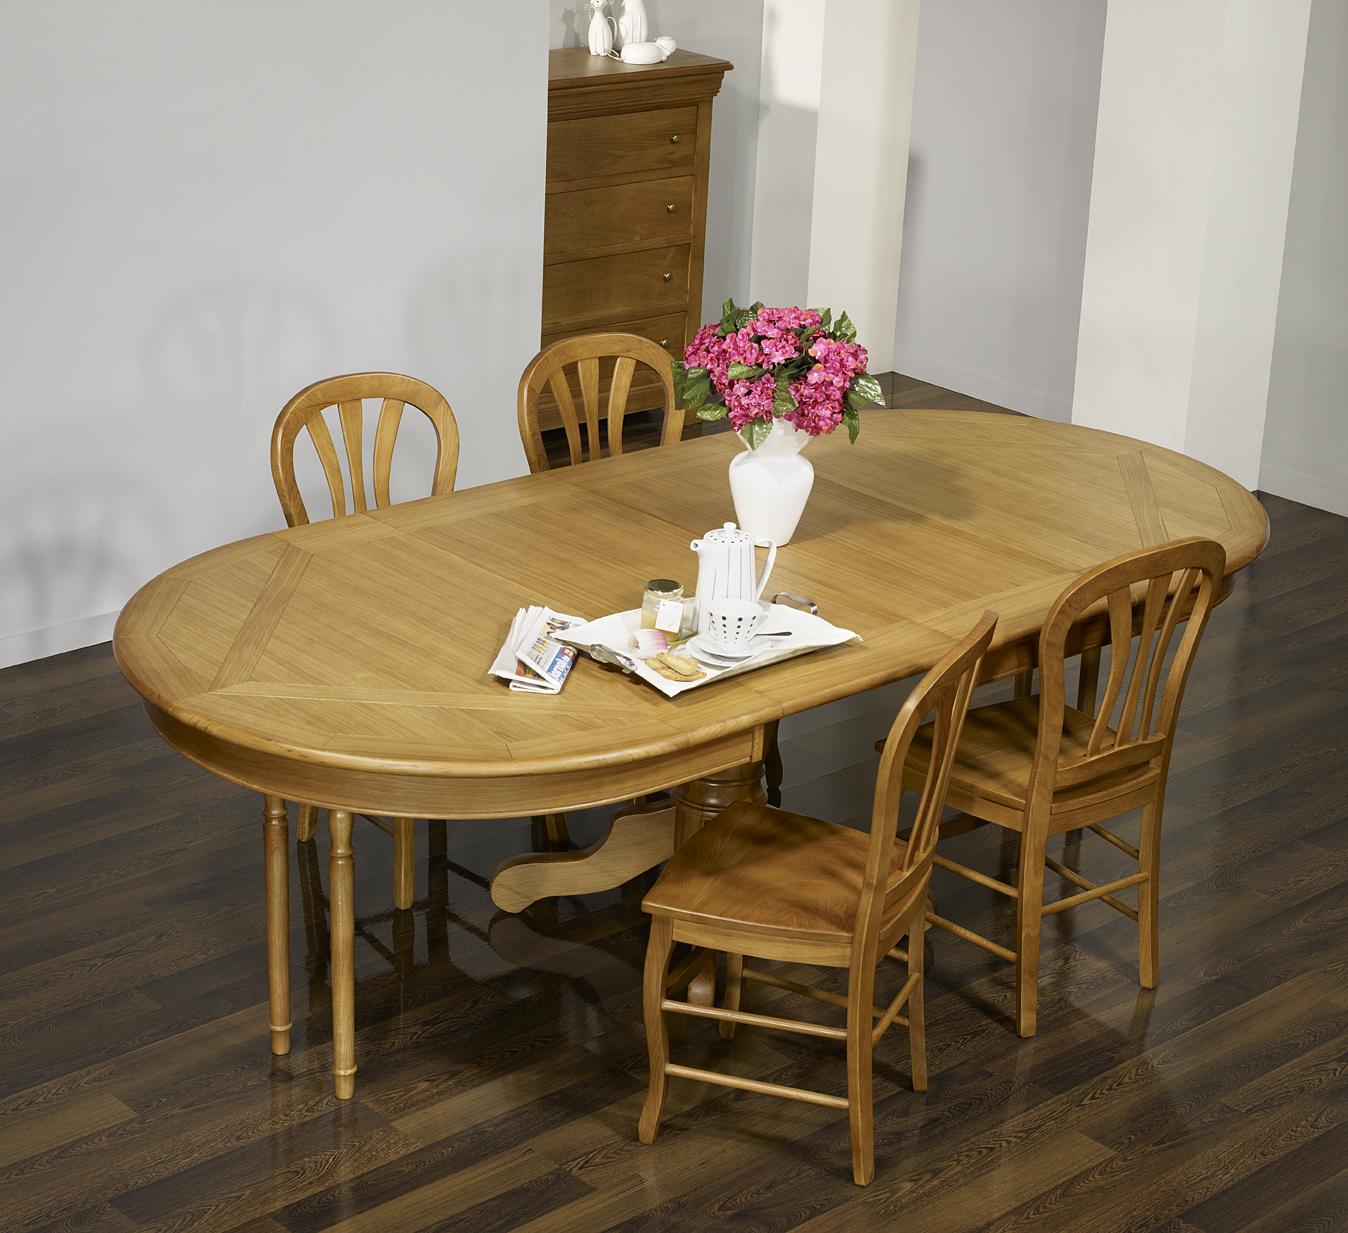 table ovale pied central fred ric 160x120 en ch ne de. Black Bedroom Furniture Sets. Home Design Ideas